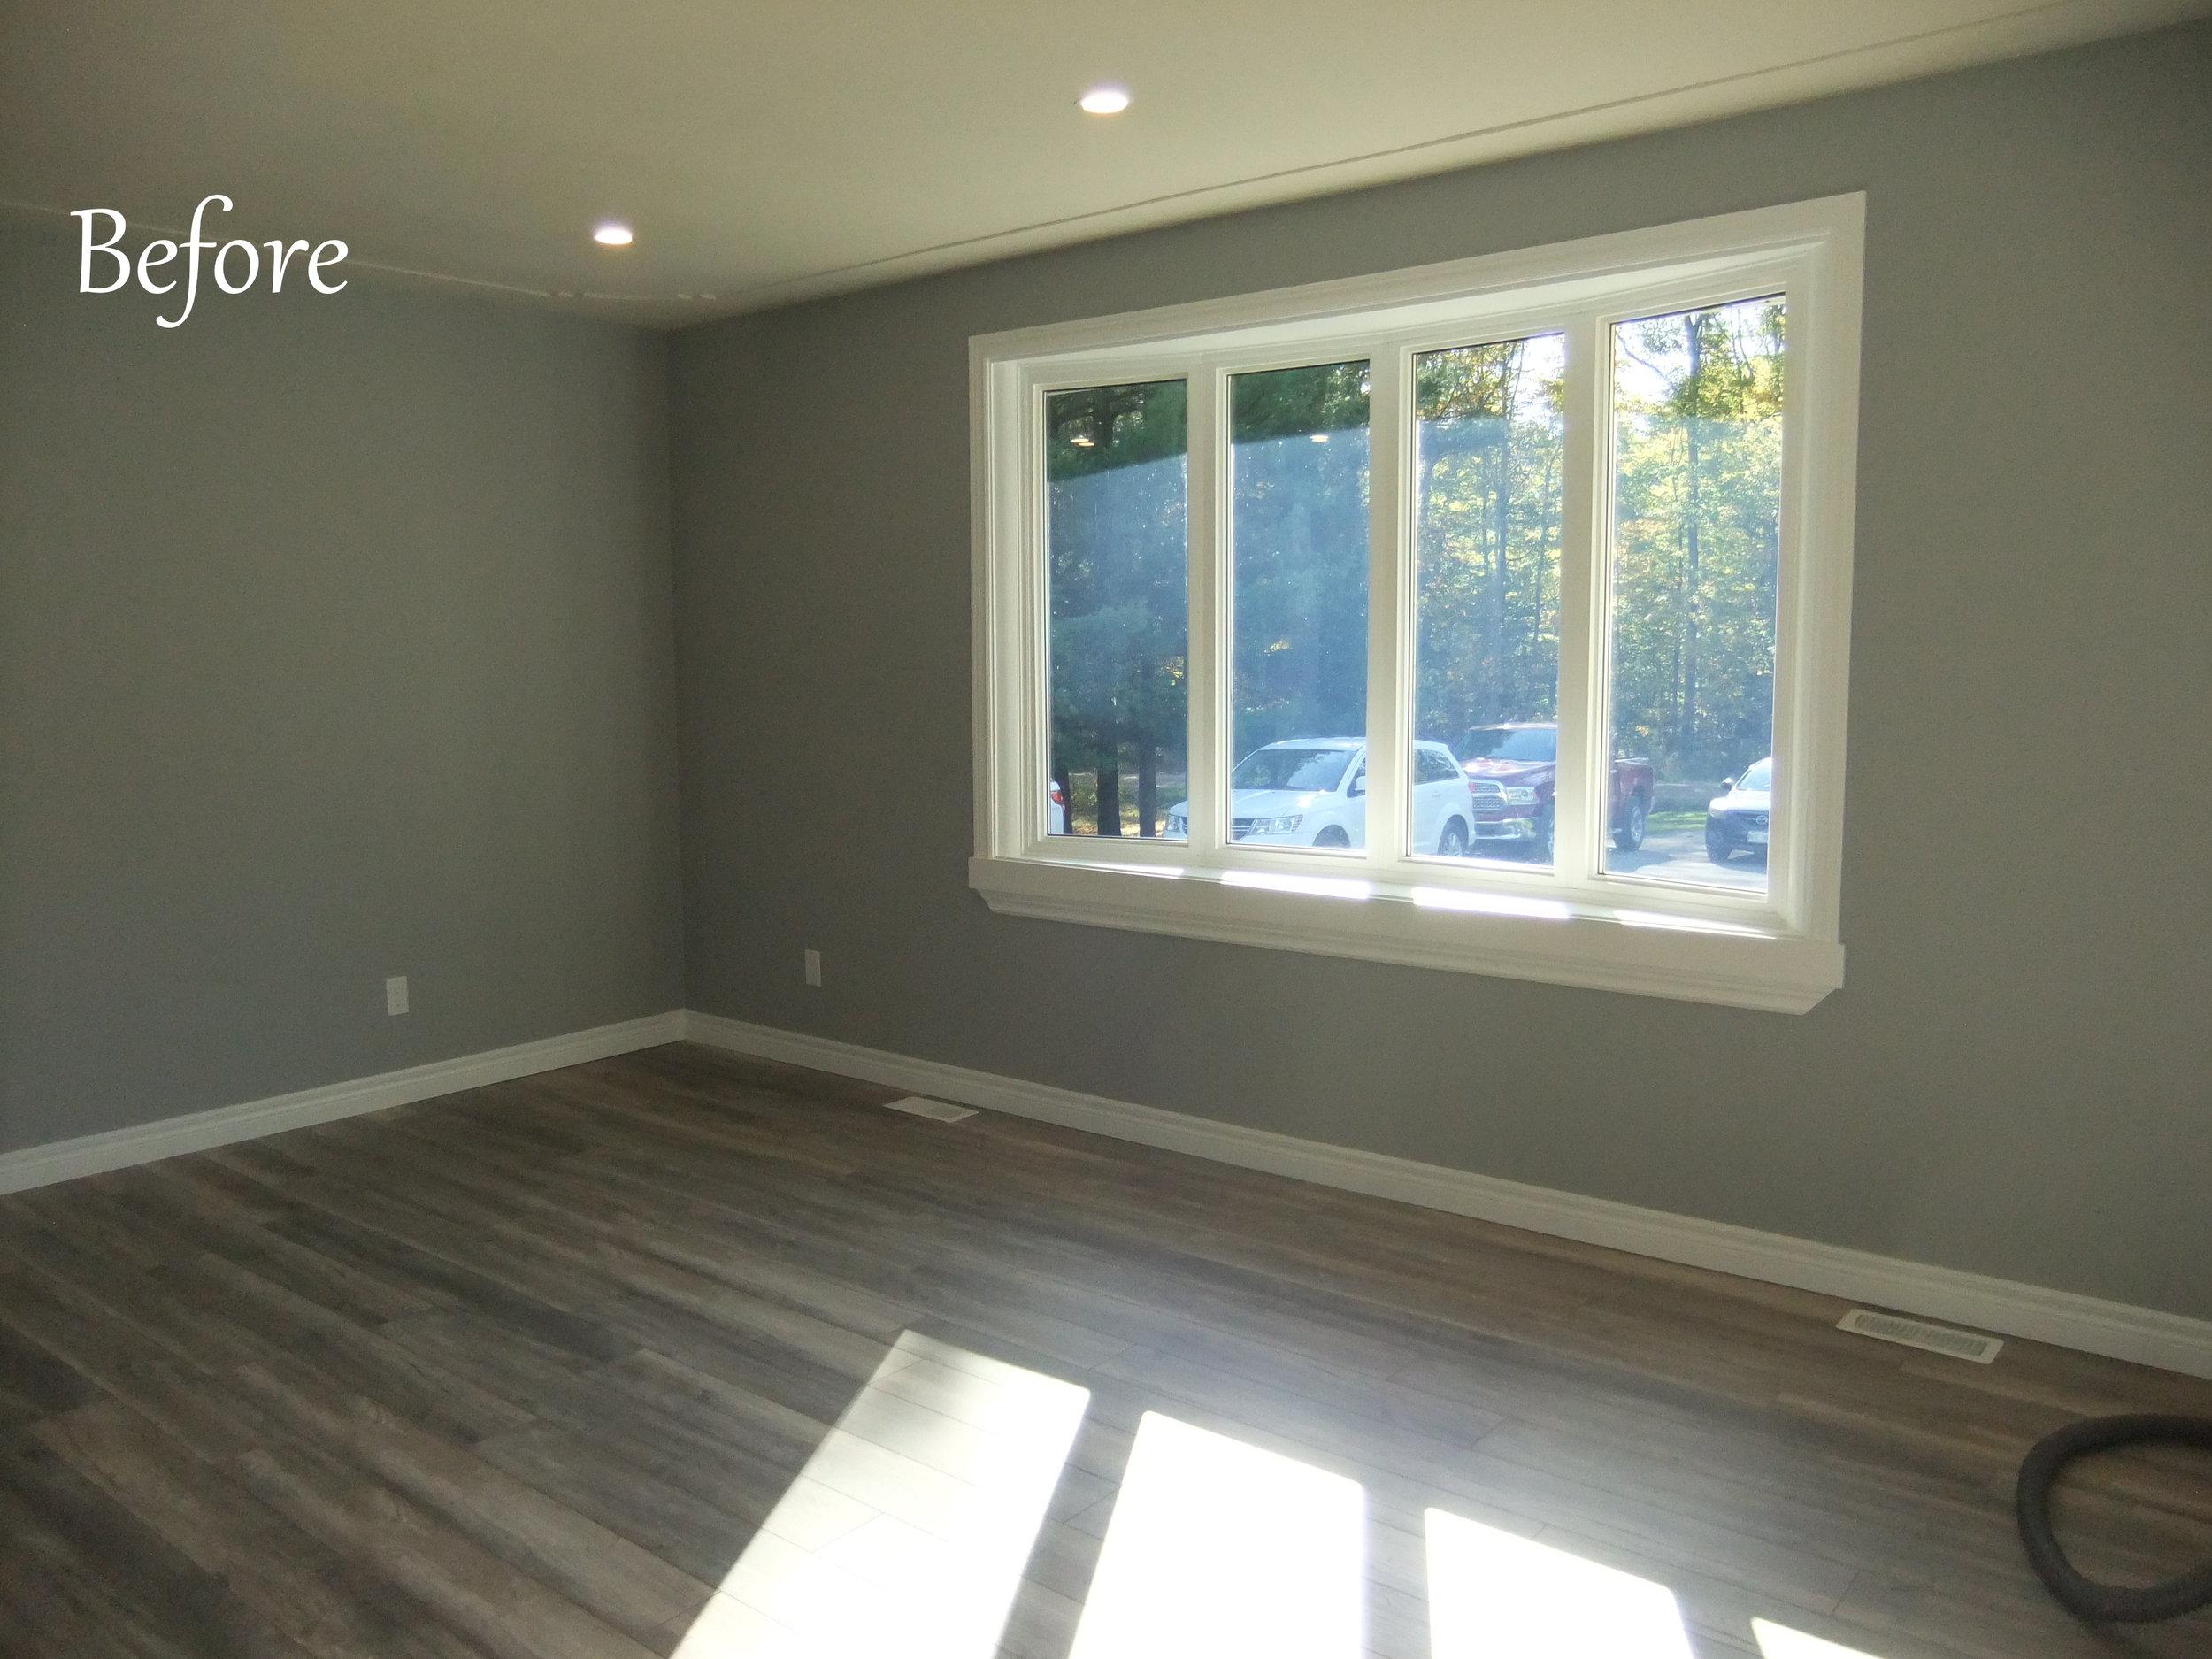 Livingroom 3 - Before 2.jpg